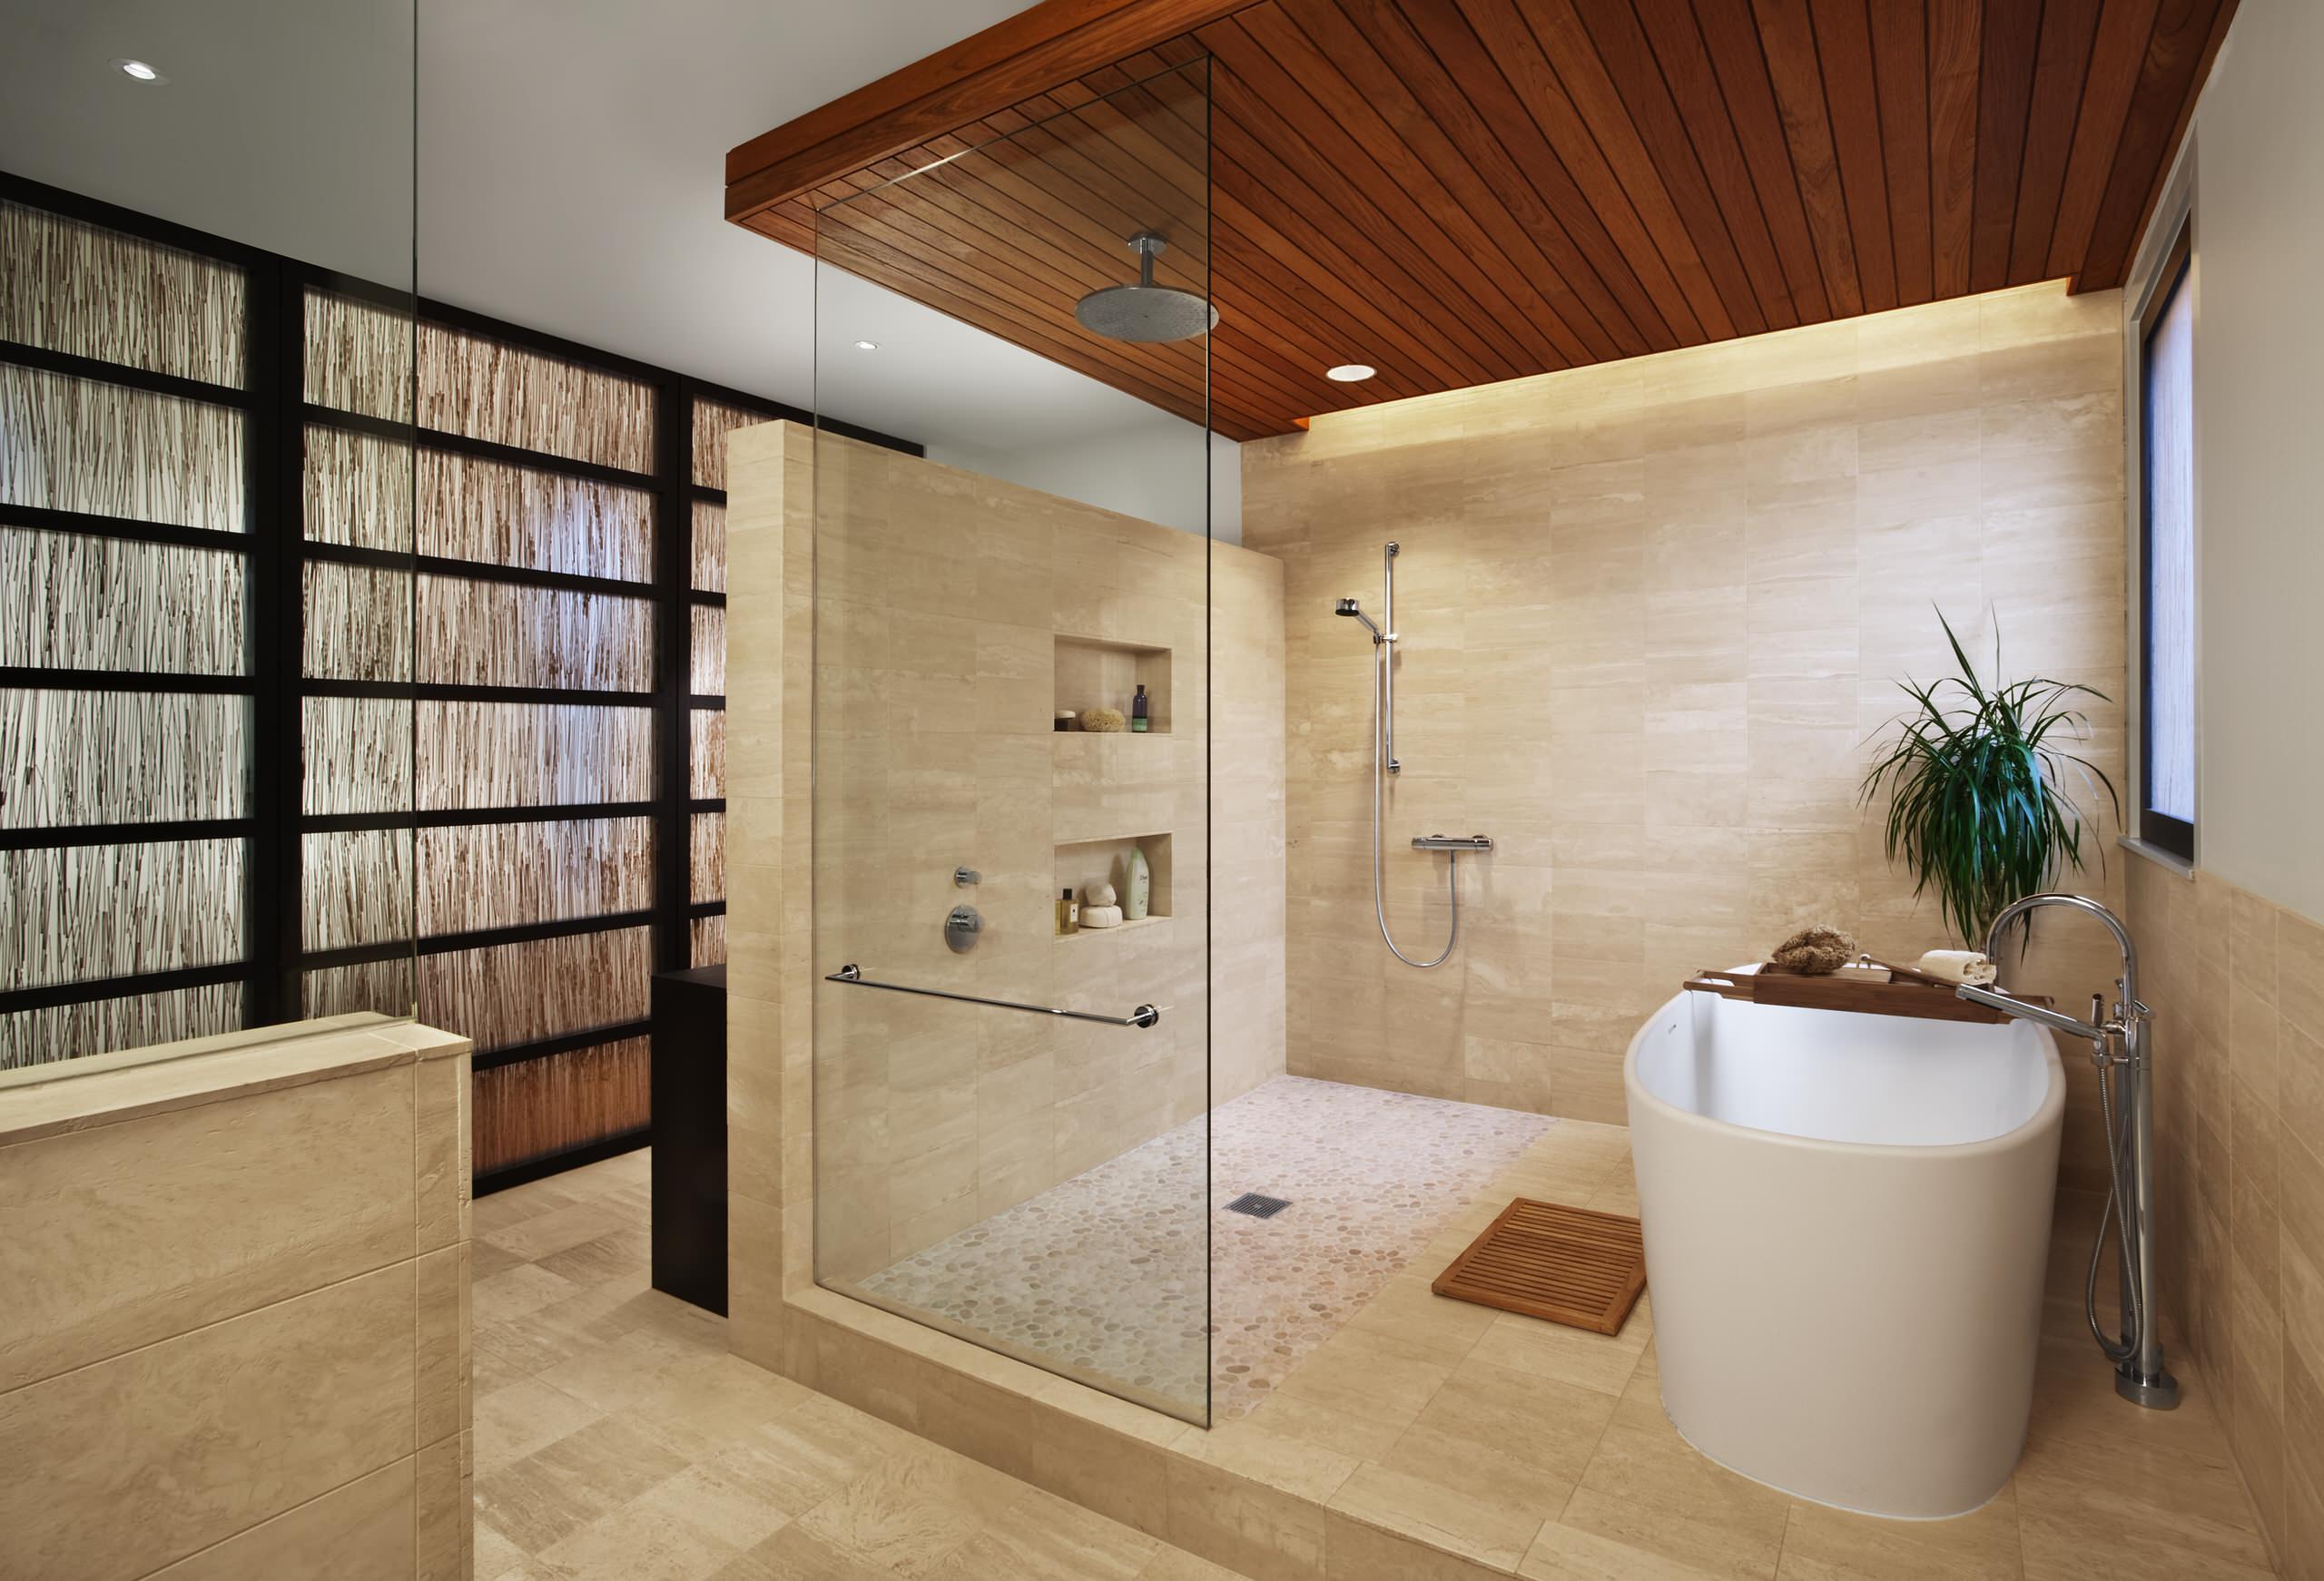 75 Beautiful Travertine Floor Bathroom Pictures Ideas June 2021 Houzz